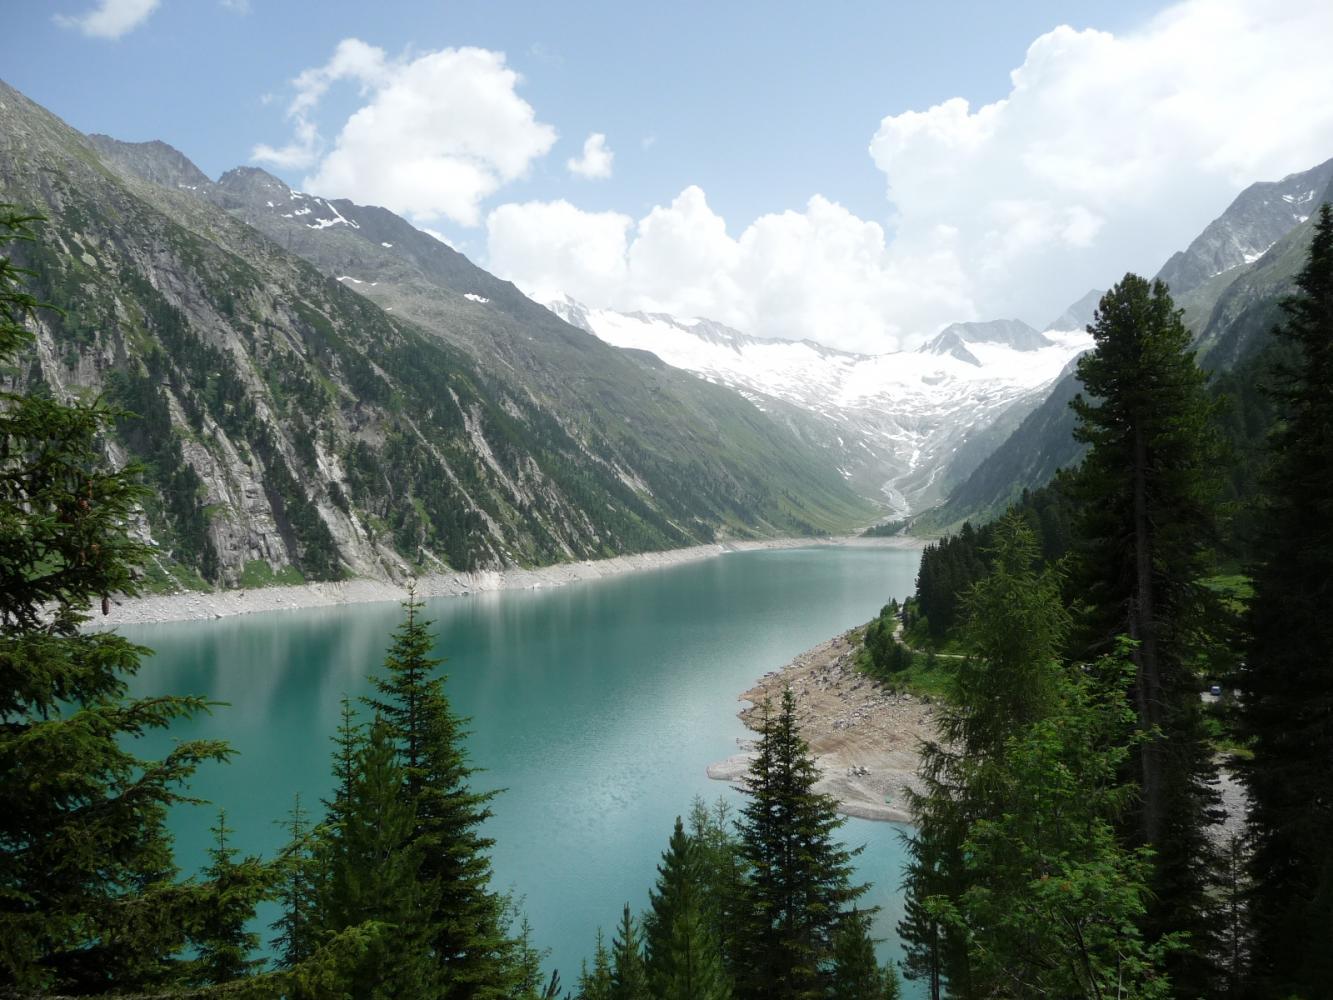 Обои австрия, alps, тироль, austria, tirol, Lake plansee, озеро планзее. Пейзажи foto 3